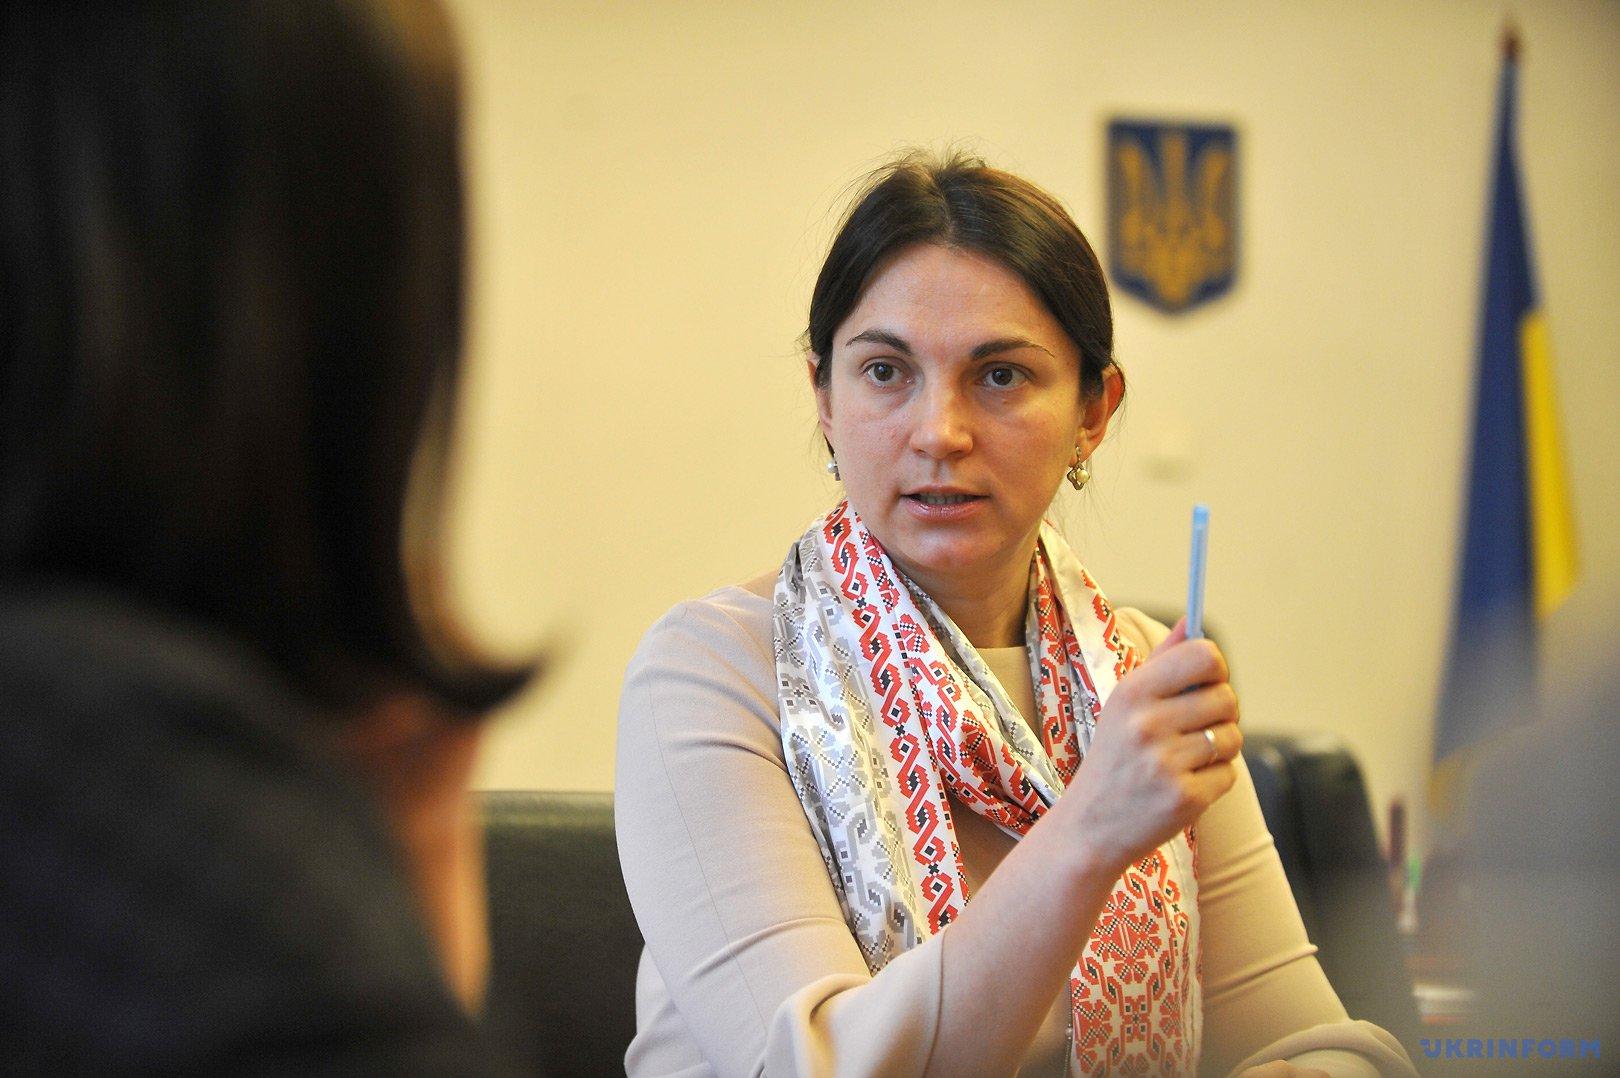 Ганна Гопко, голова Комітету Верховної Ради України у закордонних справах